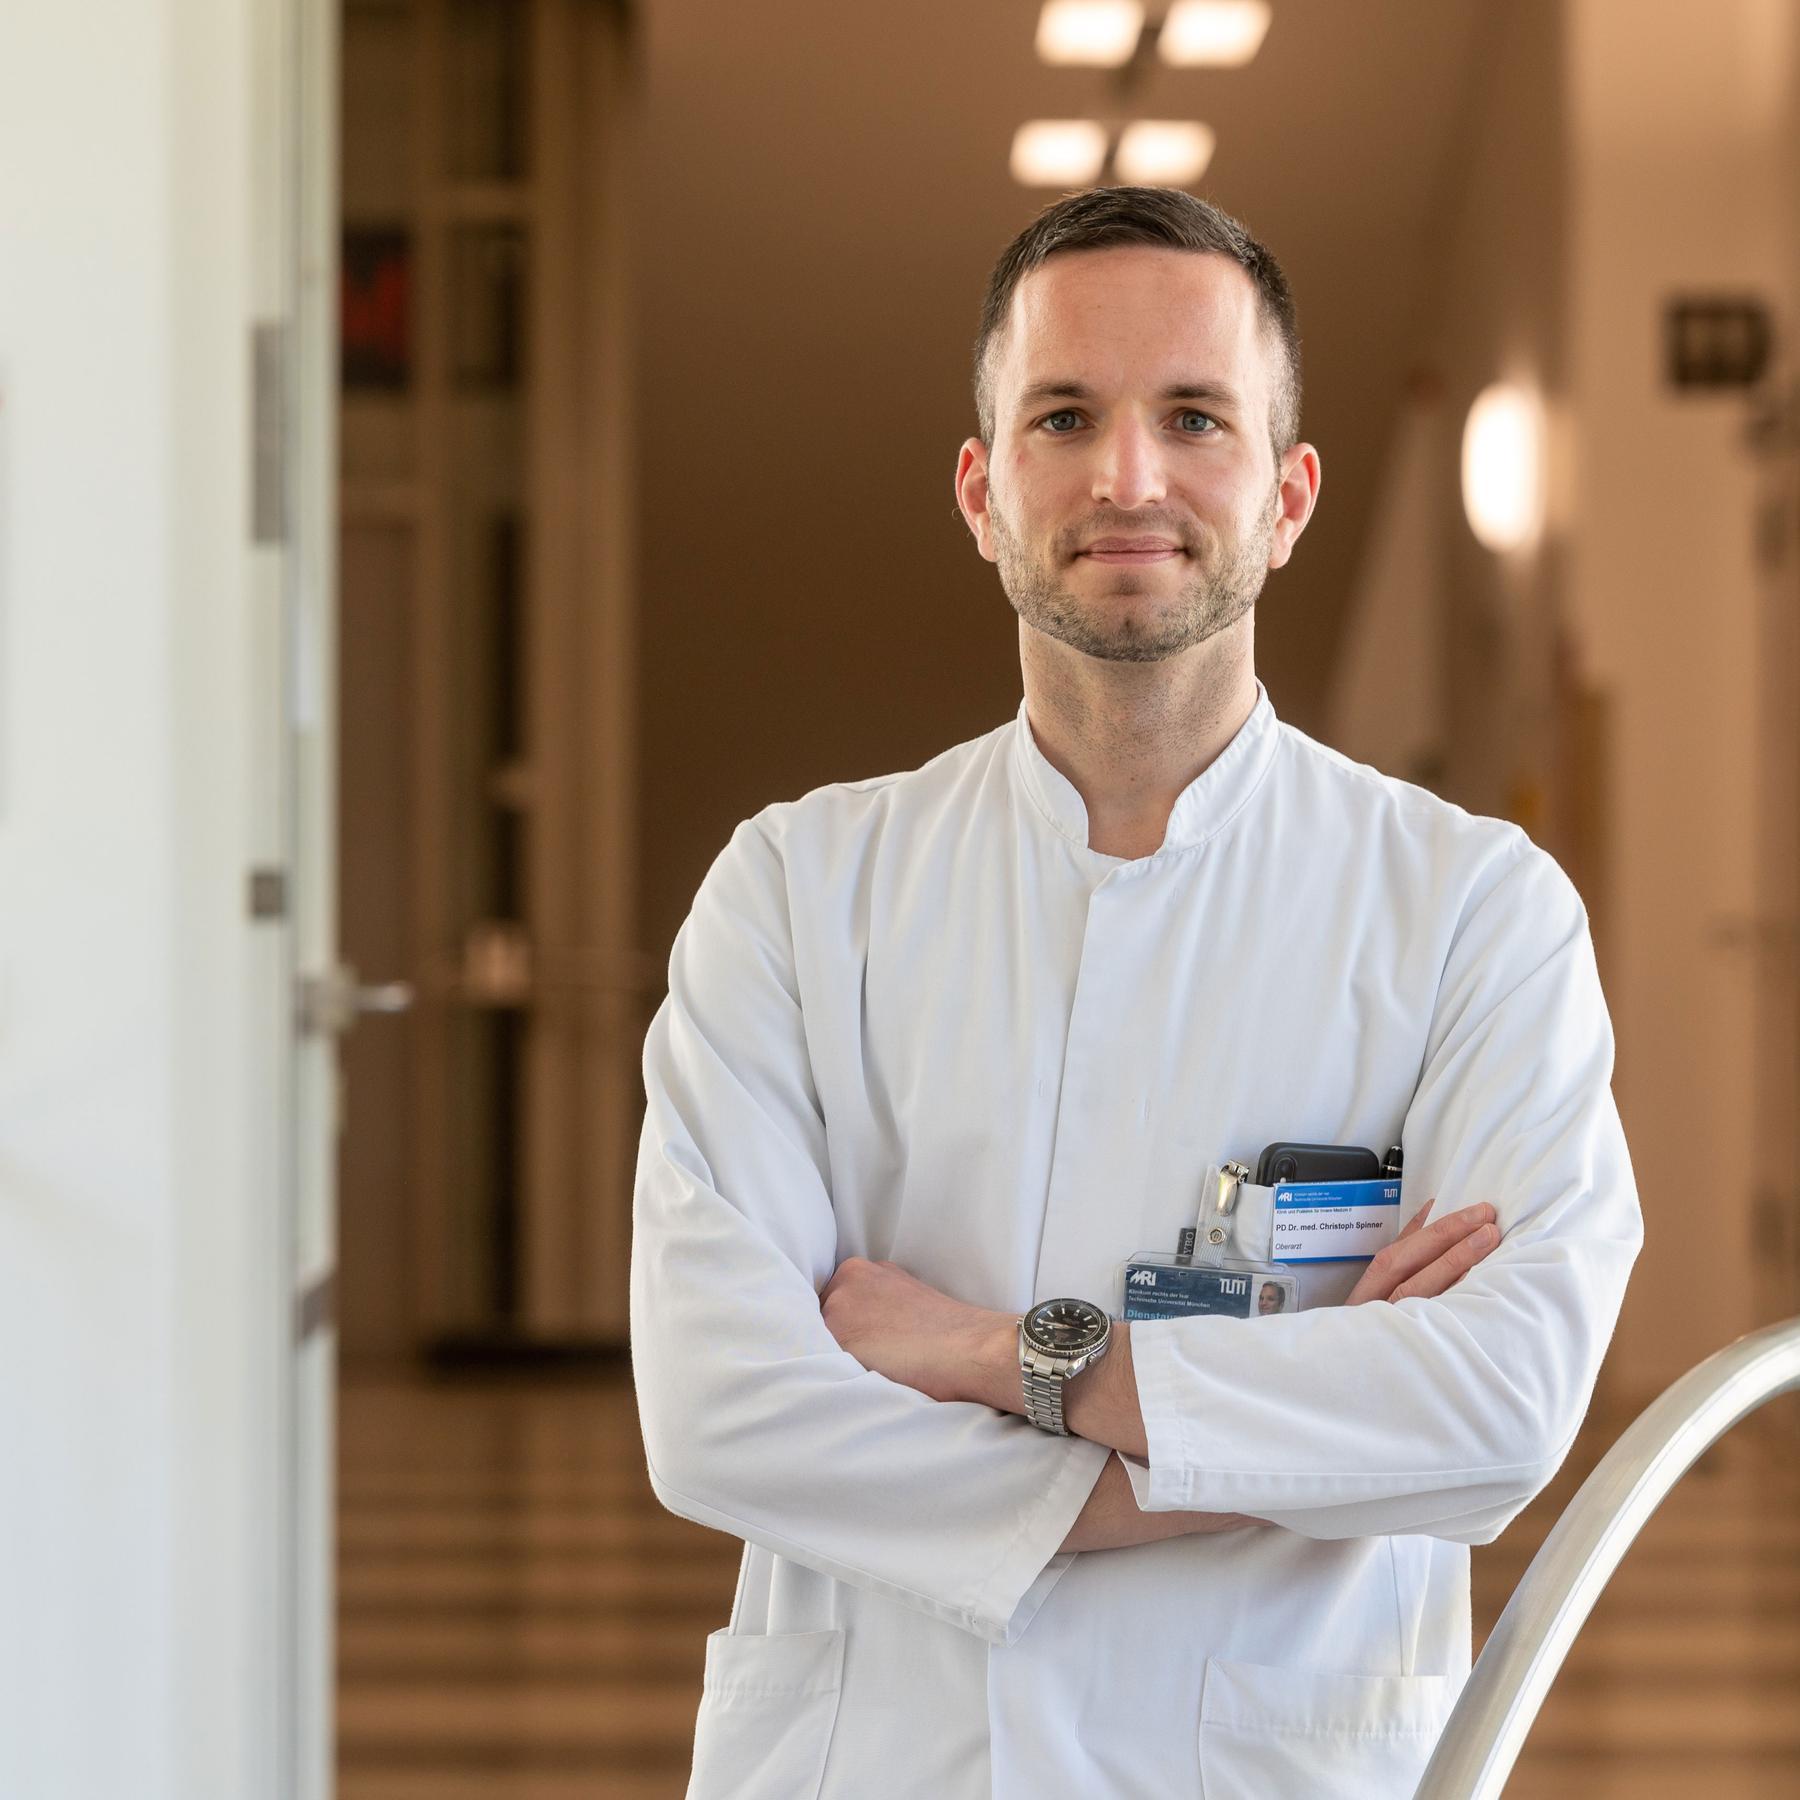 Corona-News mit Dr. Christoph Spinner (21.09.2021)